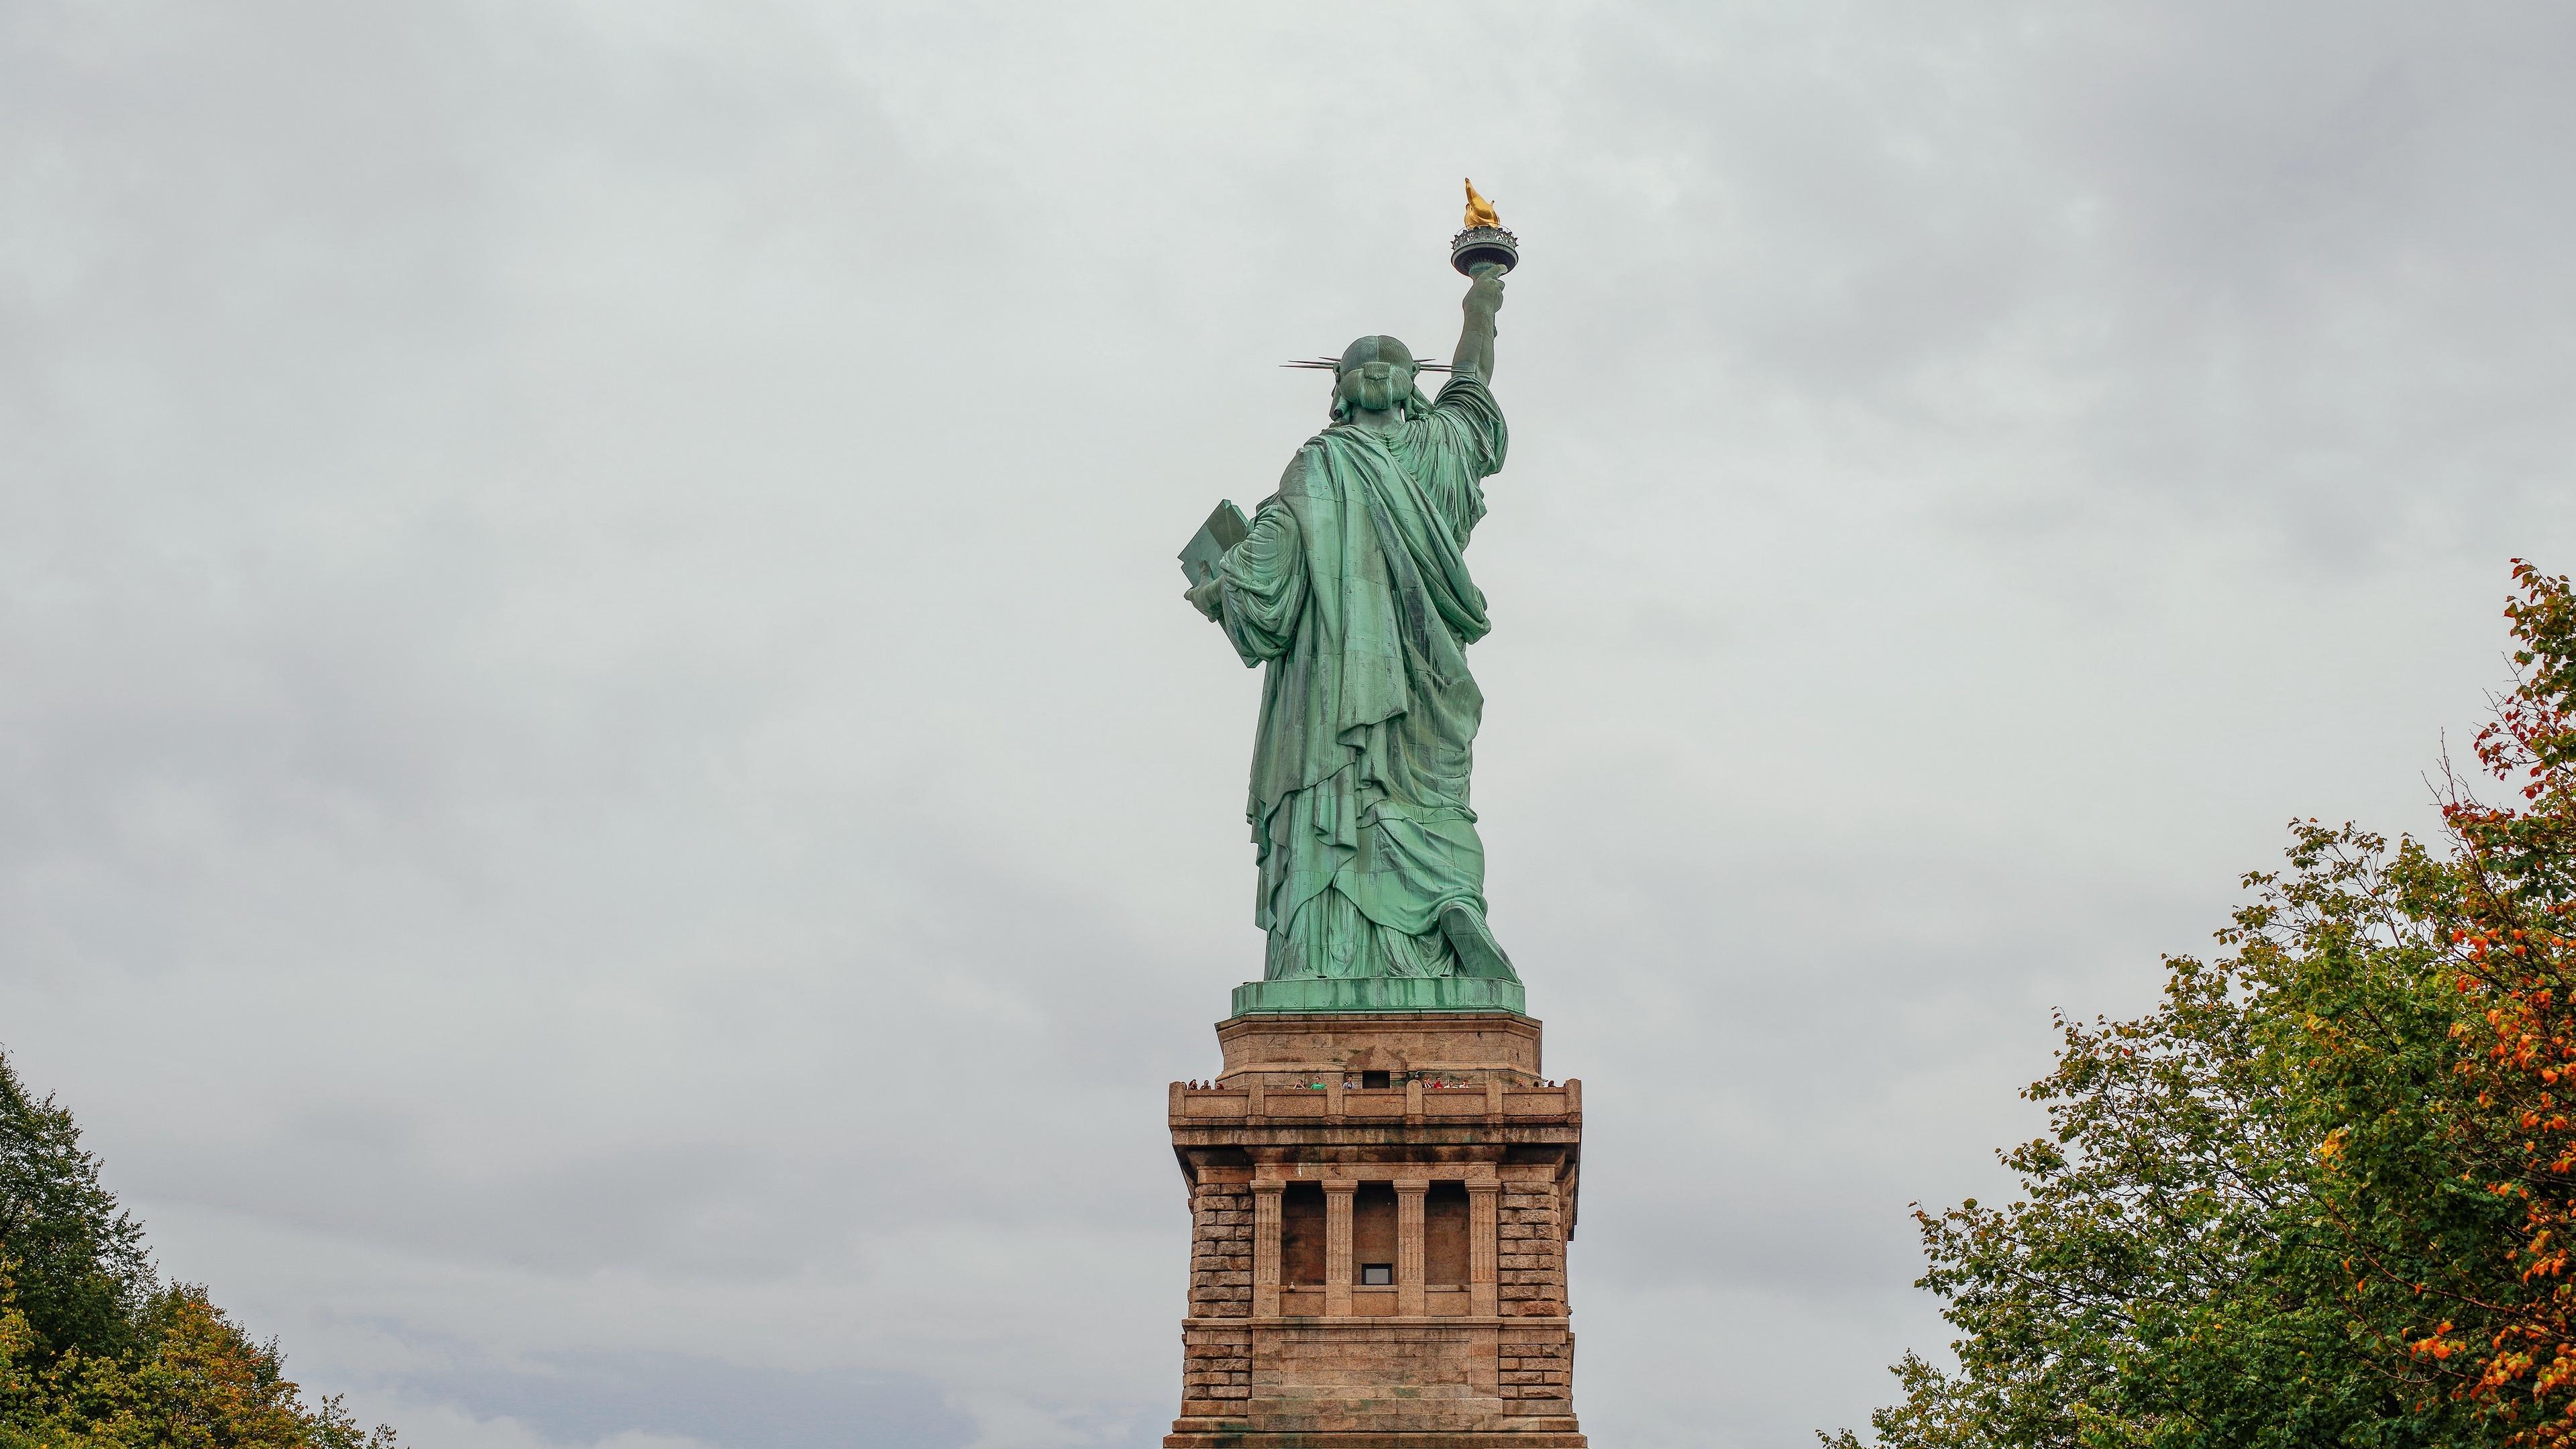 Wallpaper 4k New York Statue Of Liberty Sculpture 4k New